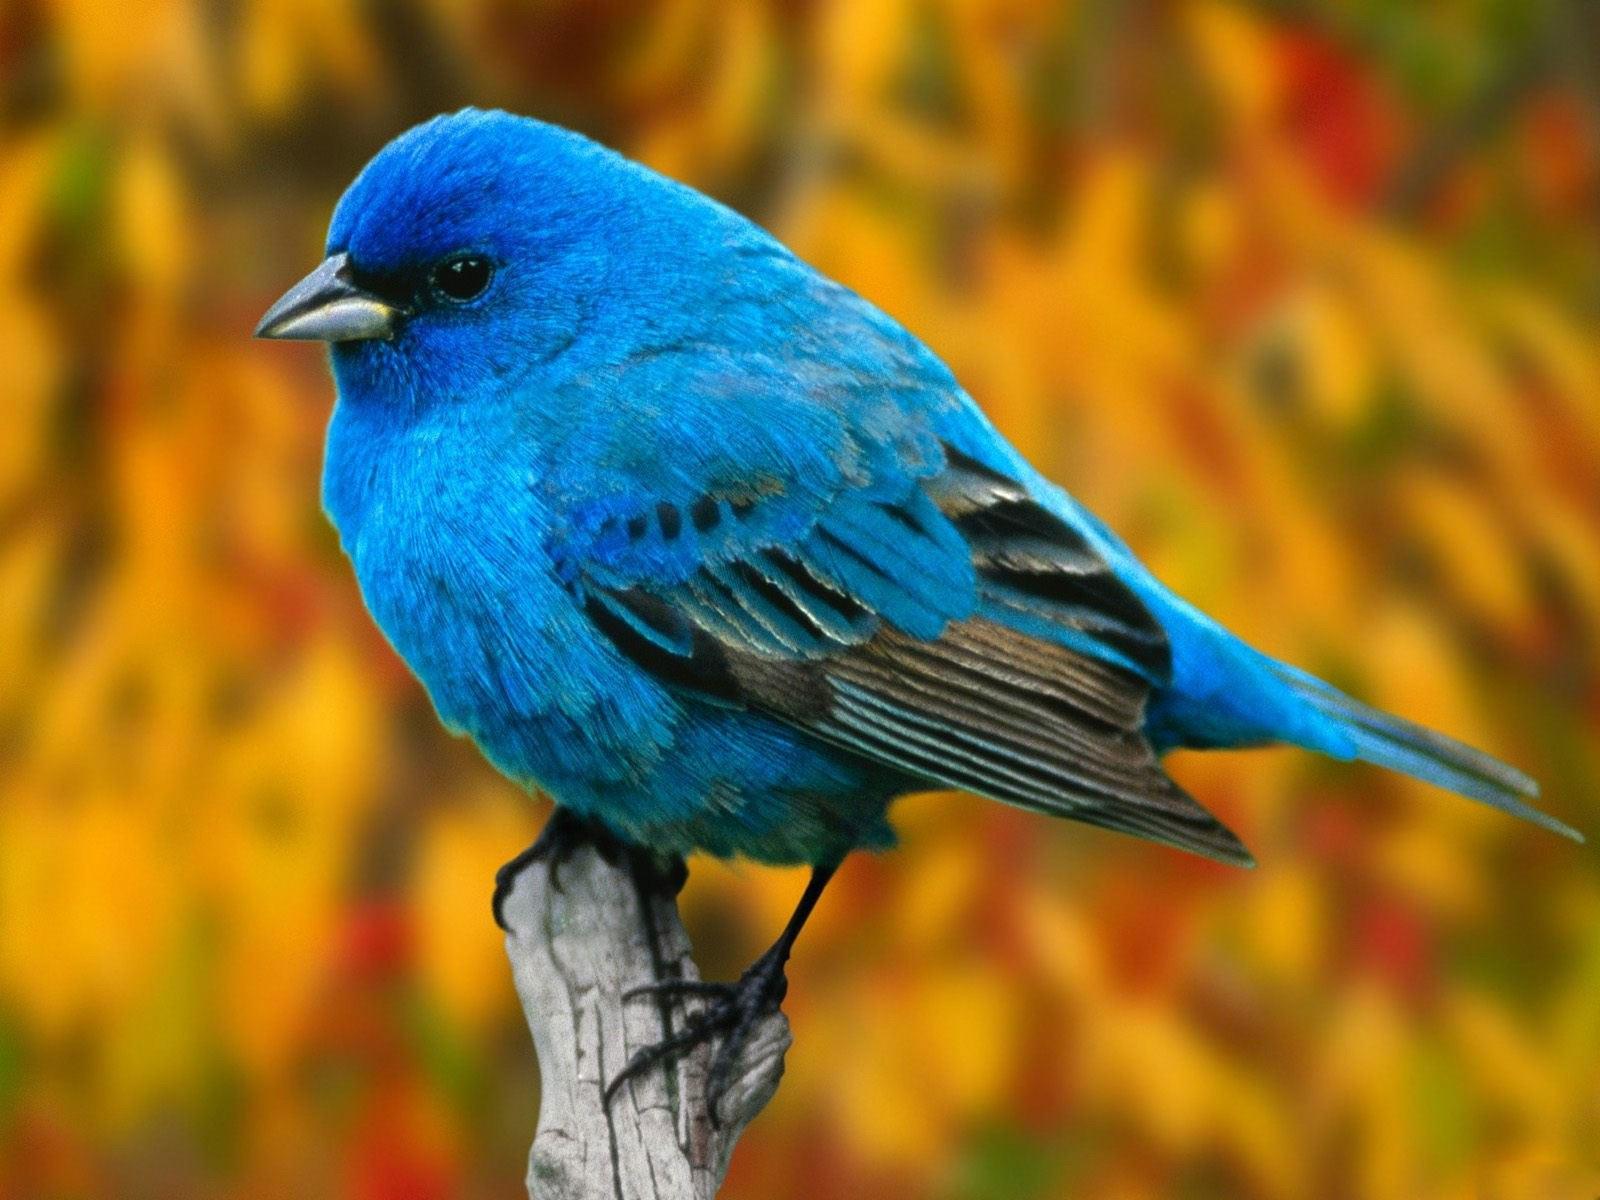 Blue Bird Wallpaper Blue bird wallpaper blue bird 1600x1200